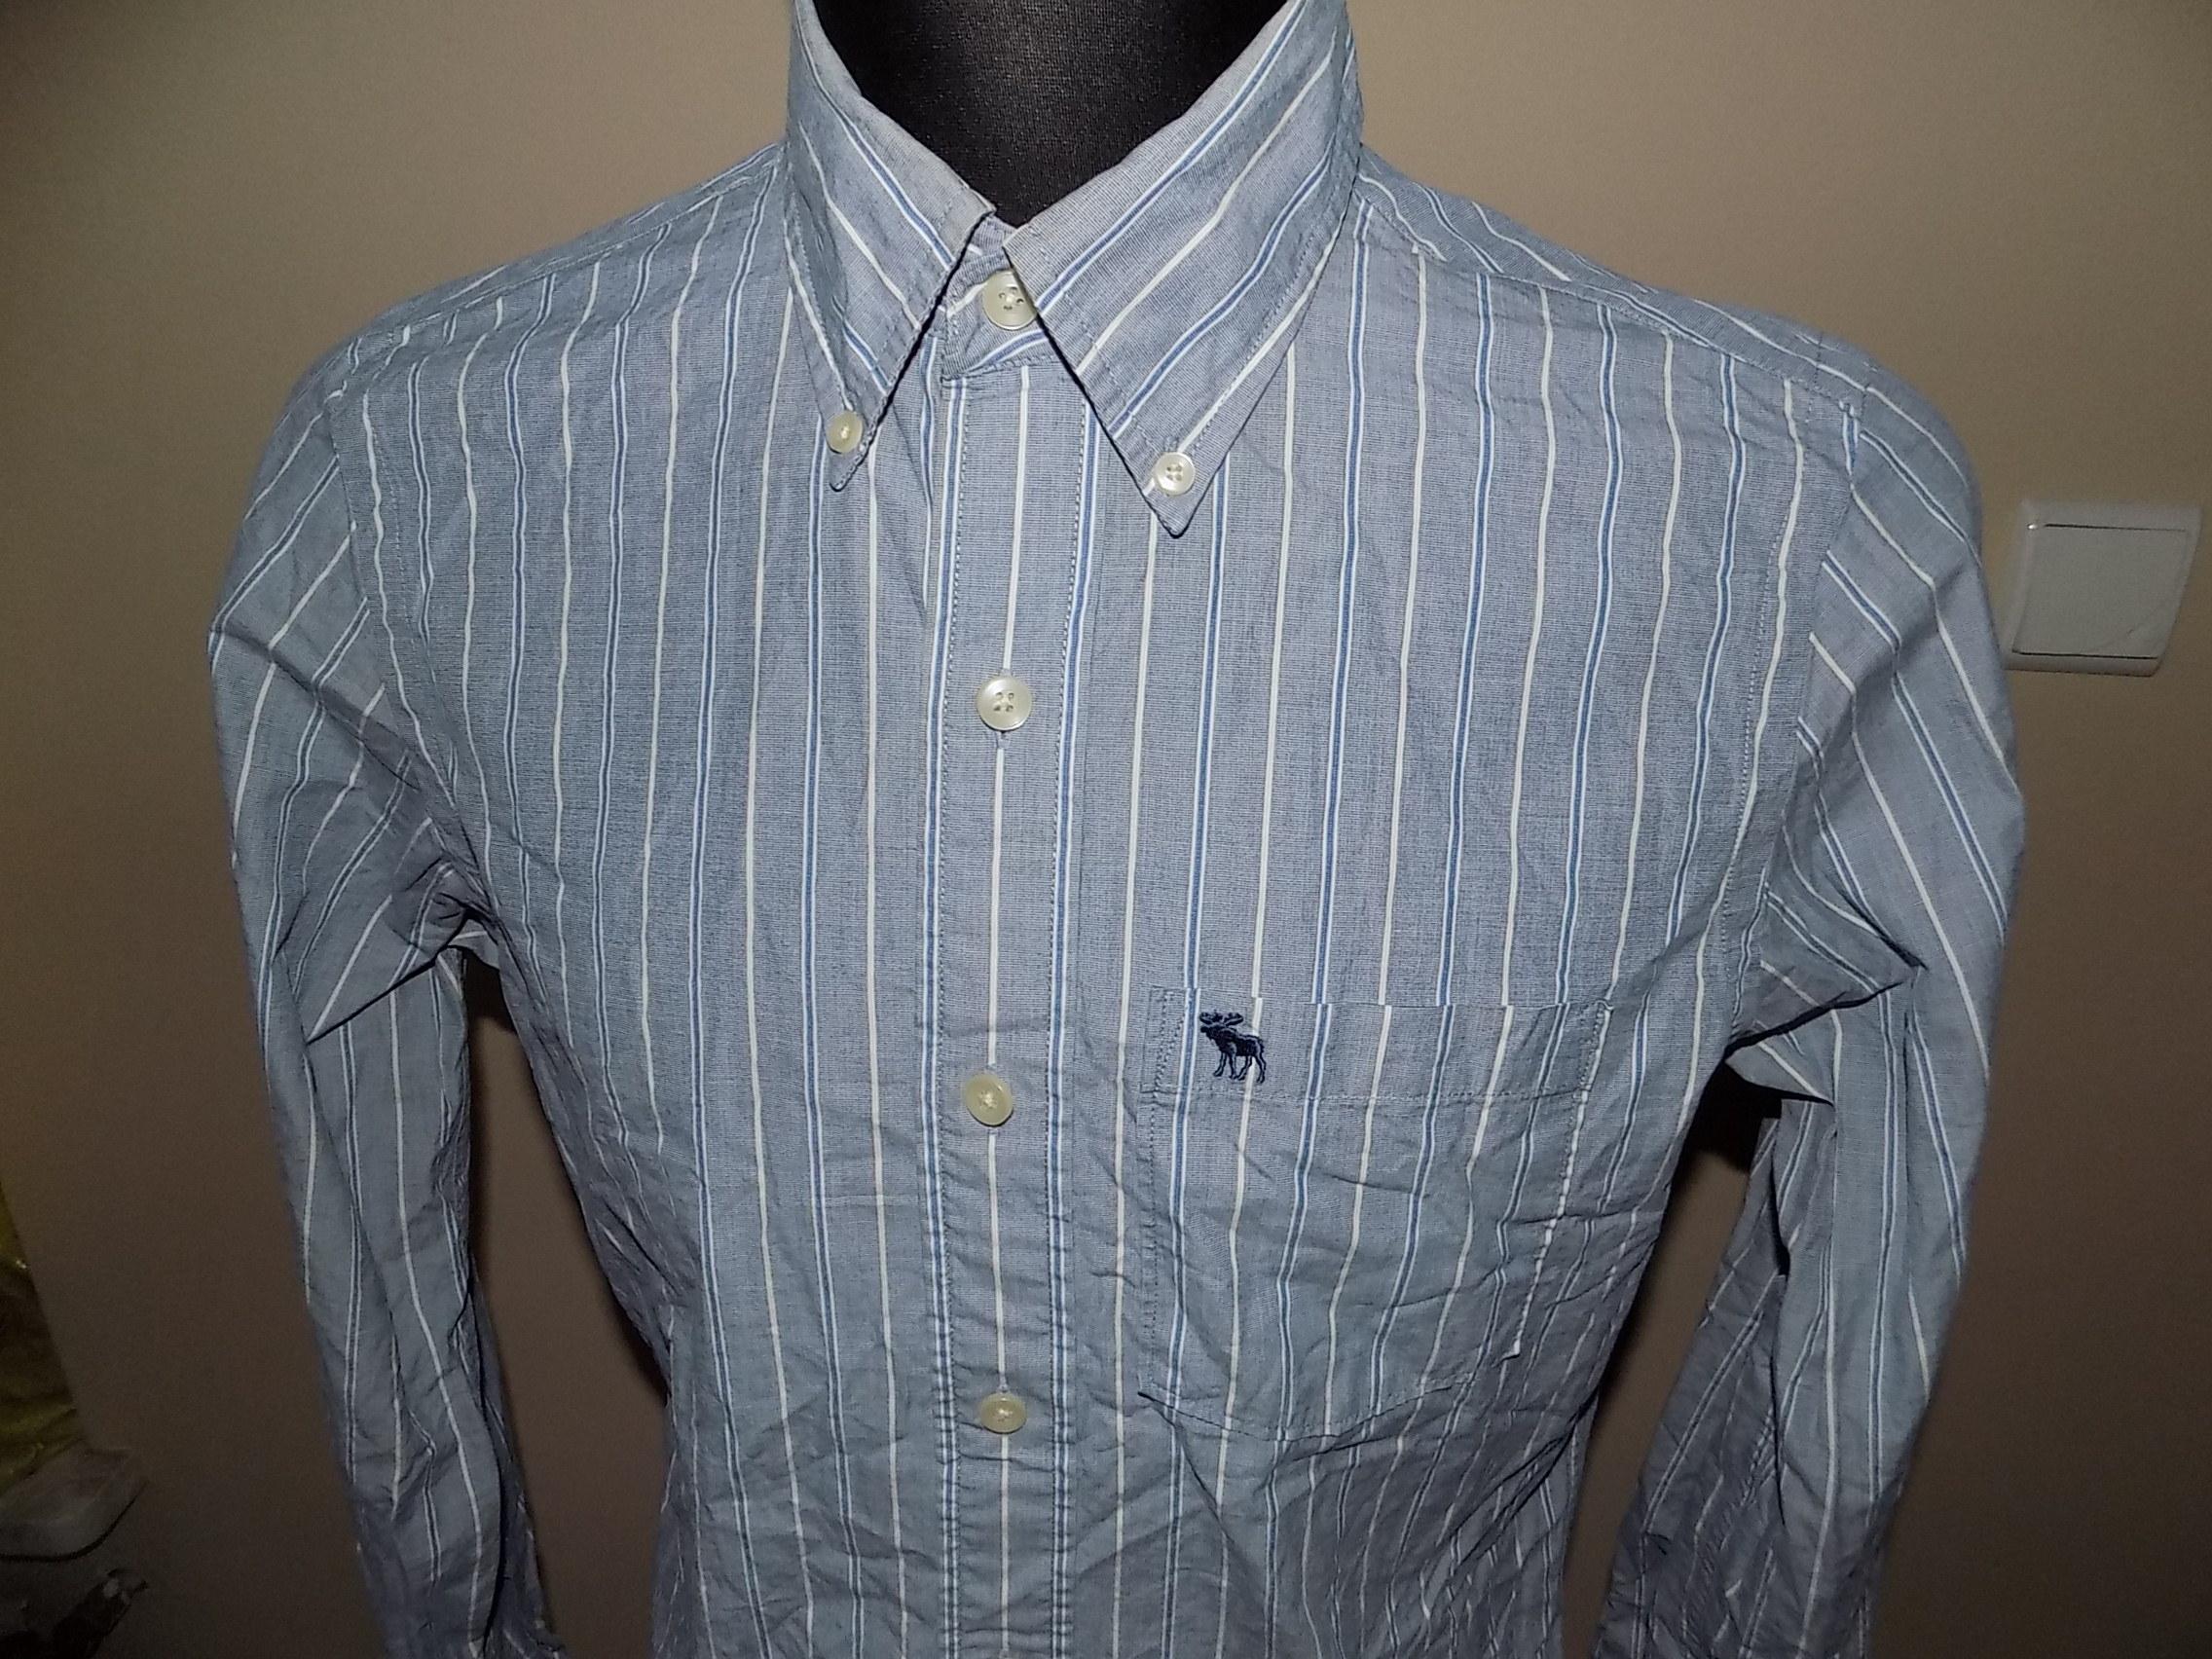 Abercrombie&Fitch koszula męska S 39 paski